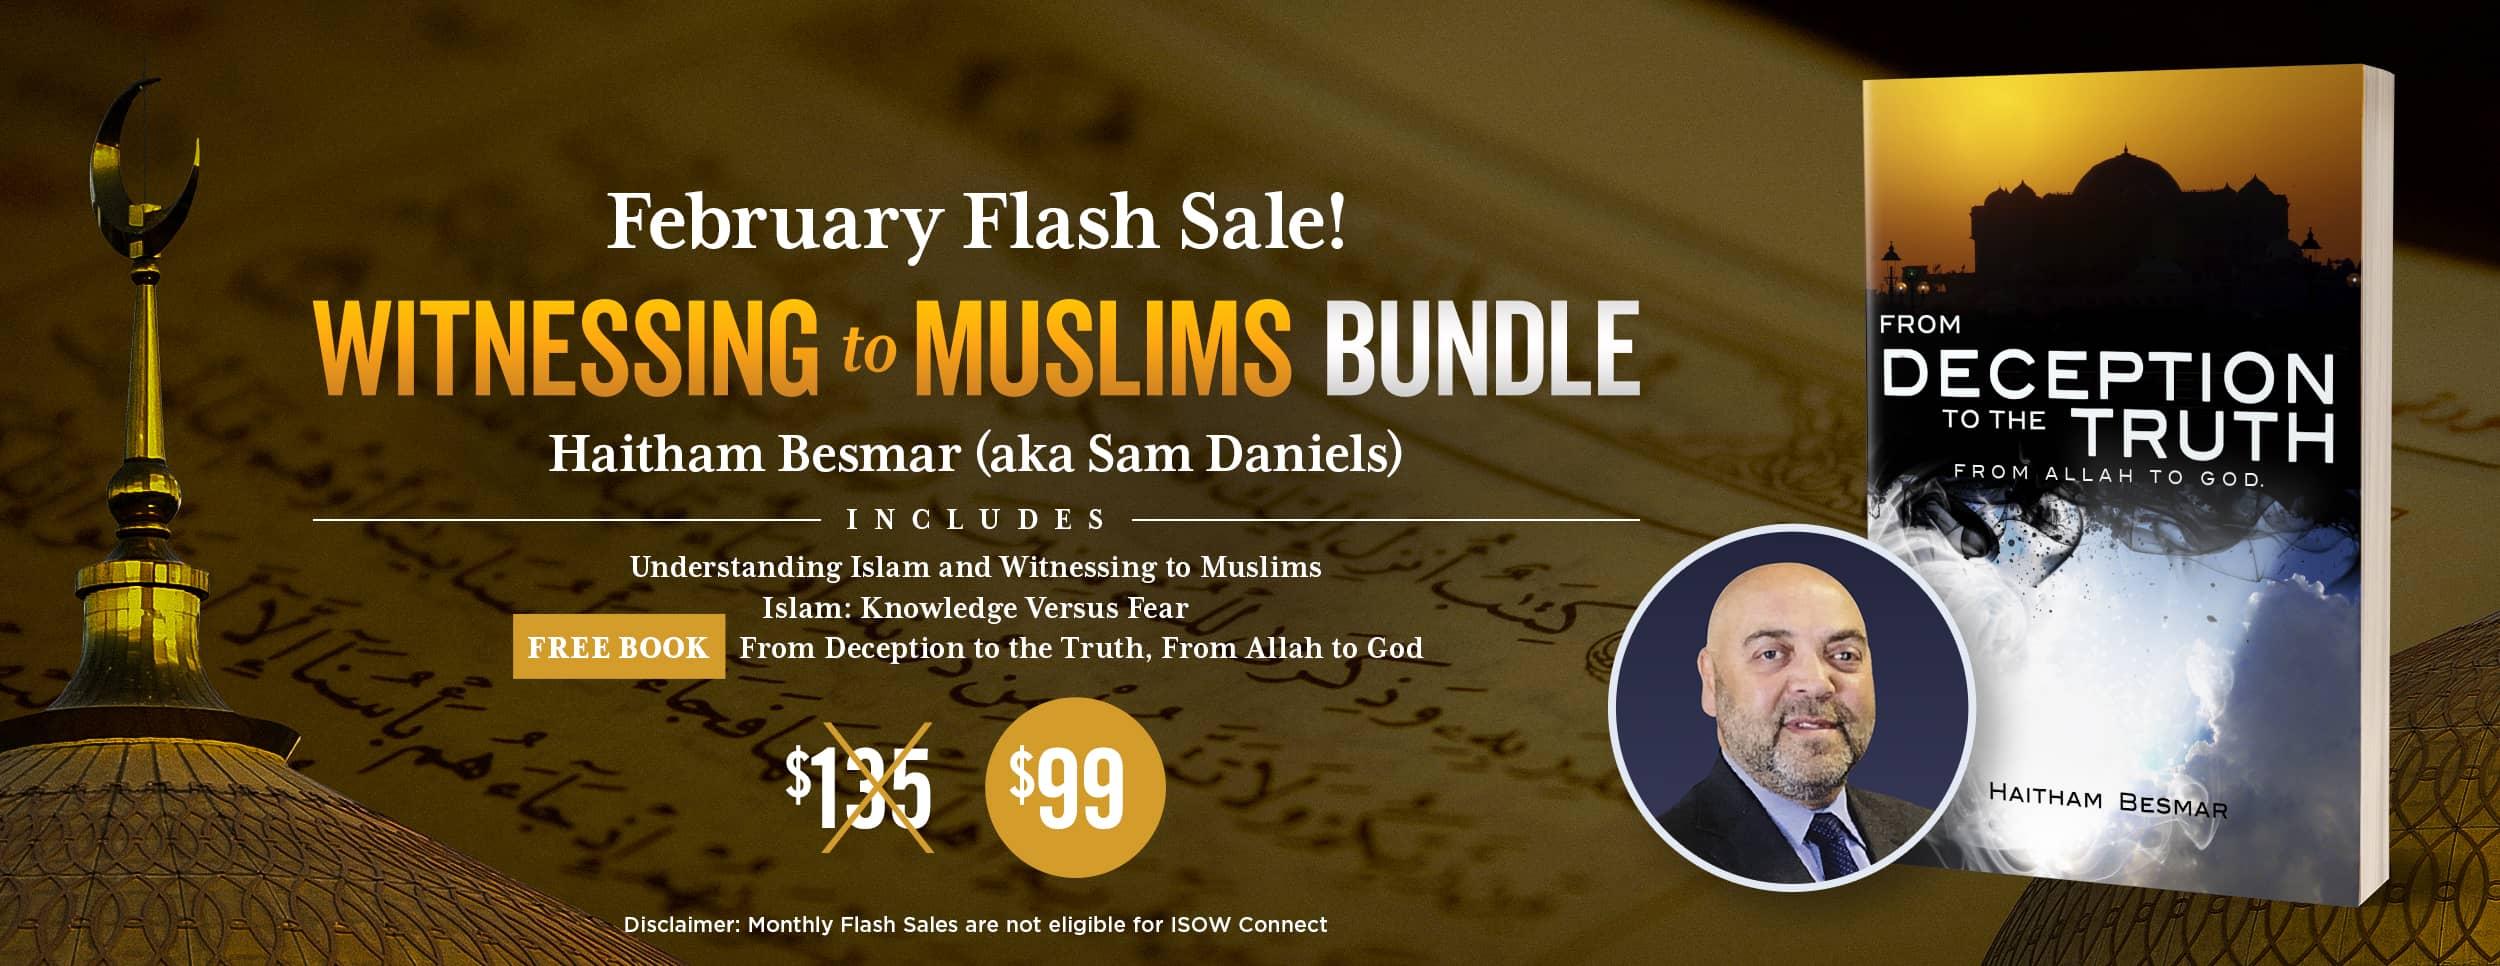 Islam Bundle Flash Sale Website Banner